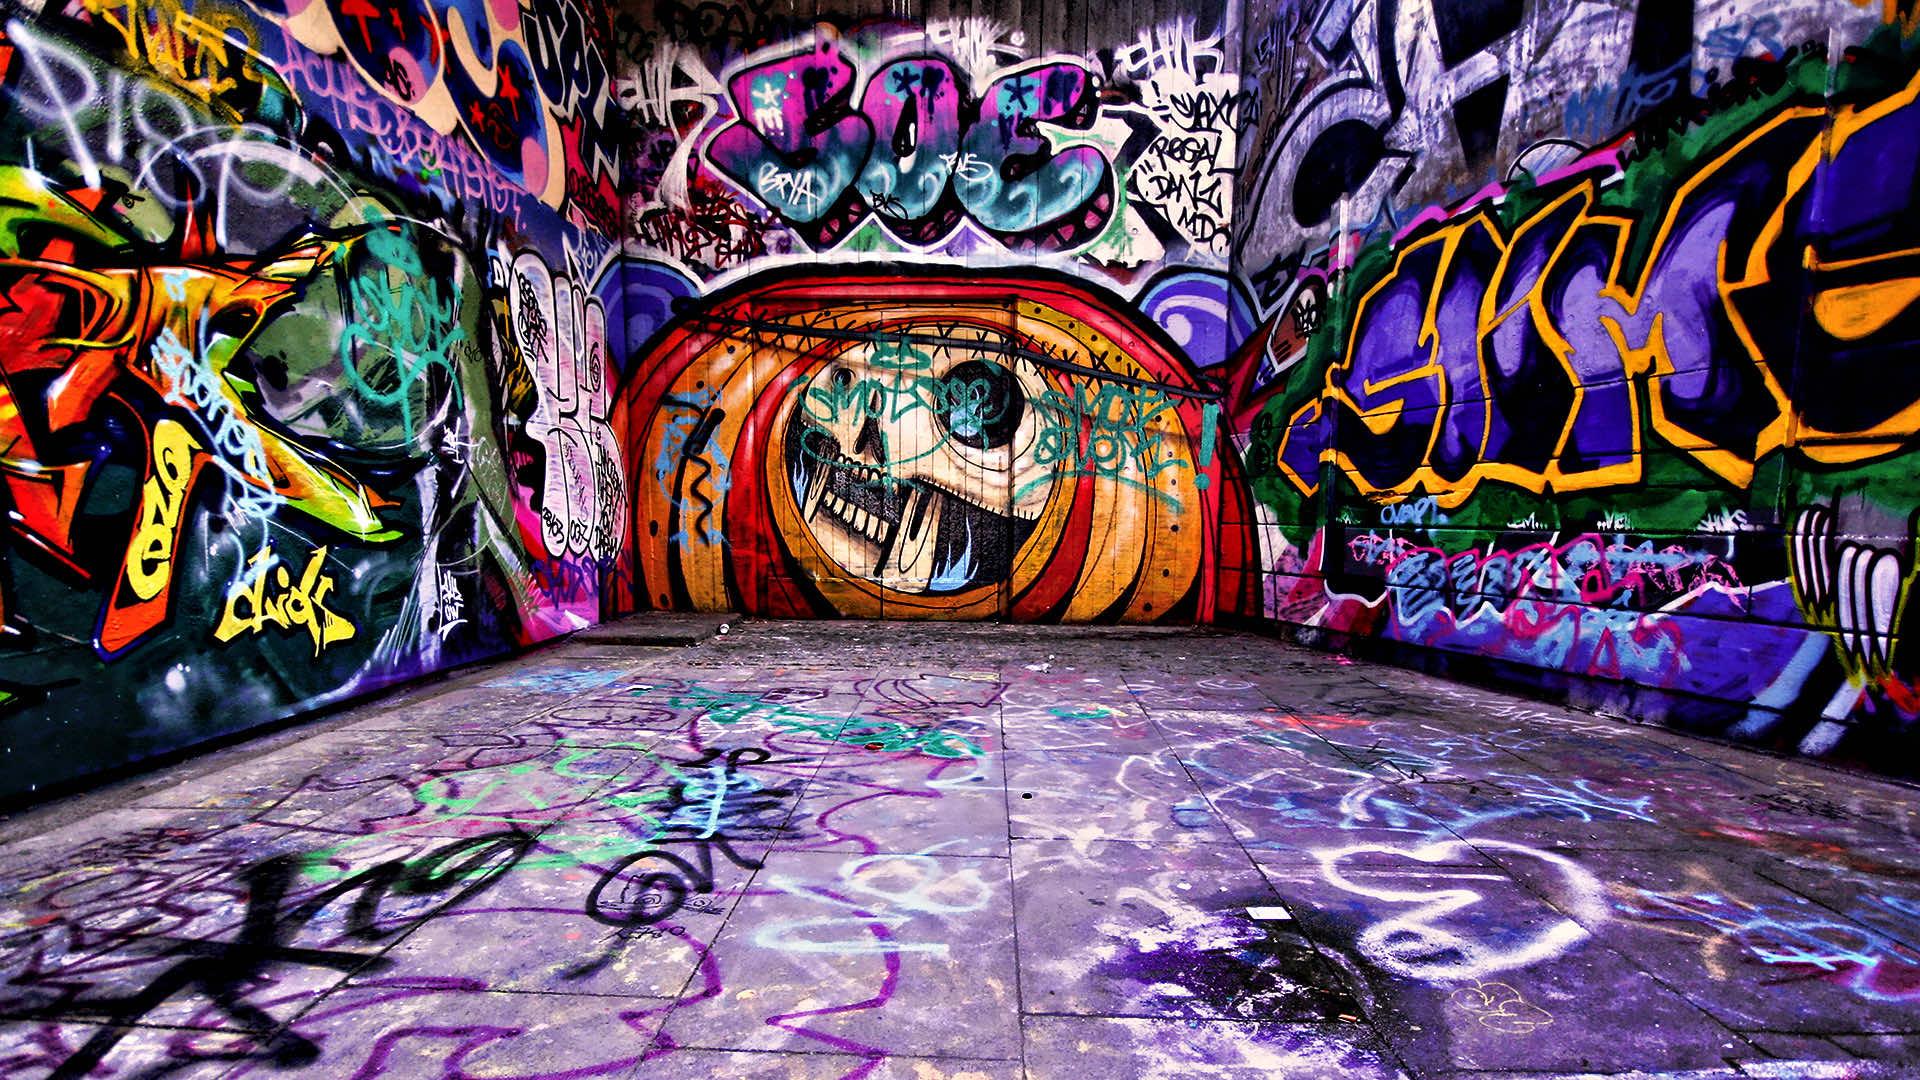 Graffiti Wallpaper Backgrounds